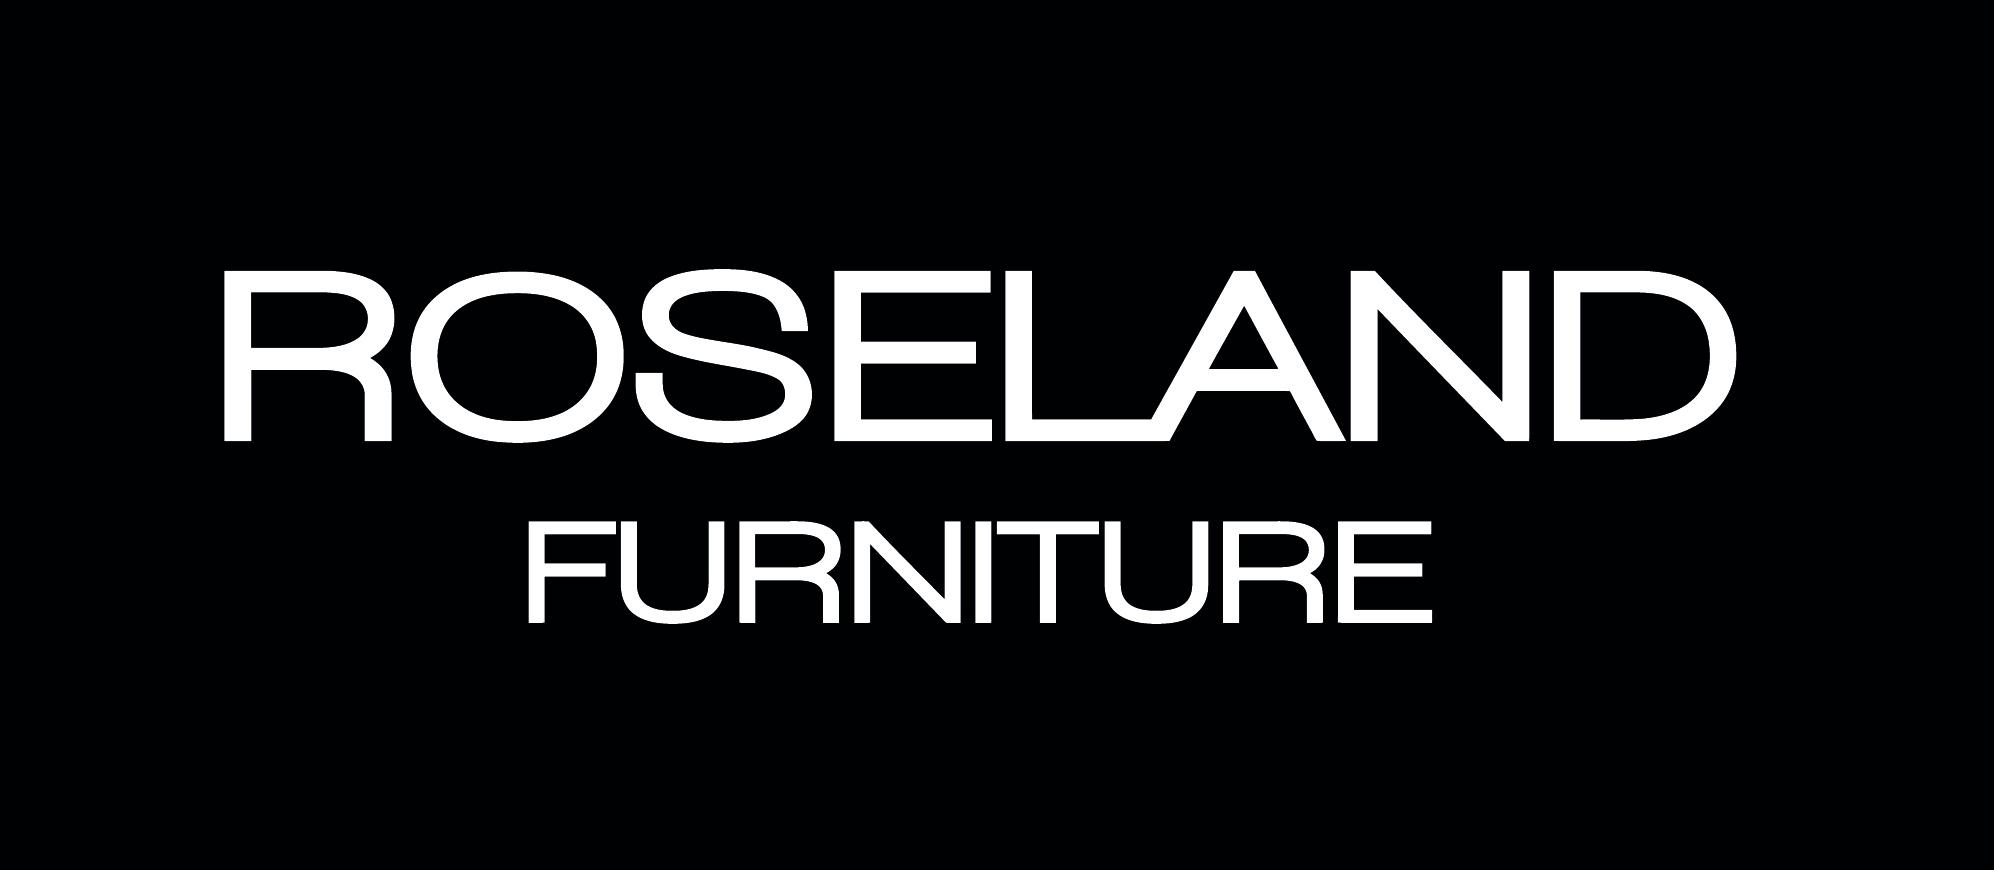 Read Roseland Furniture Reviews